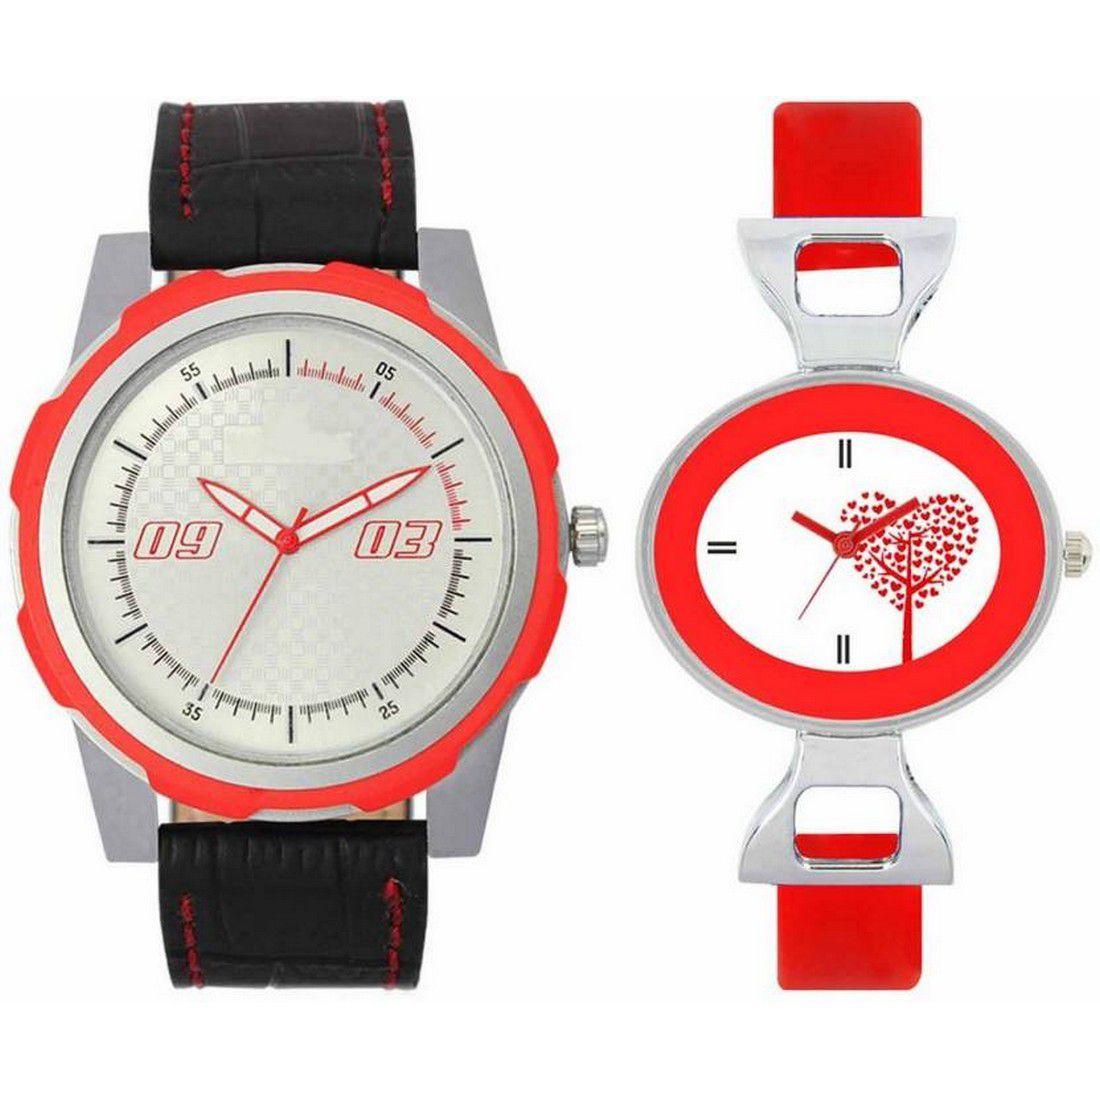 piu collection watch